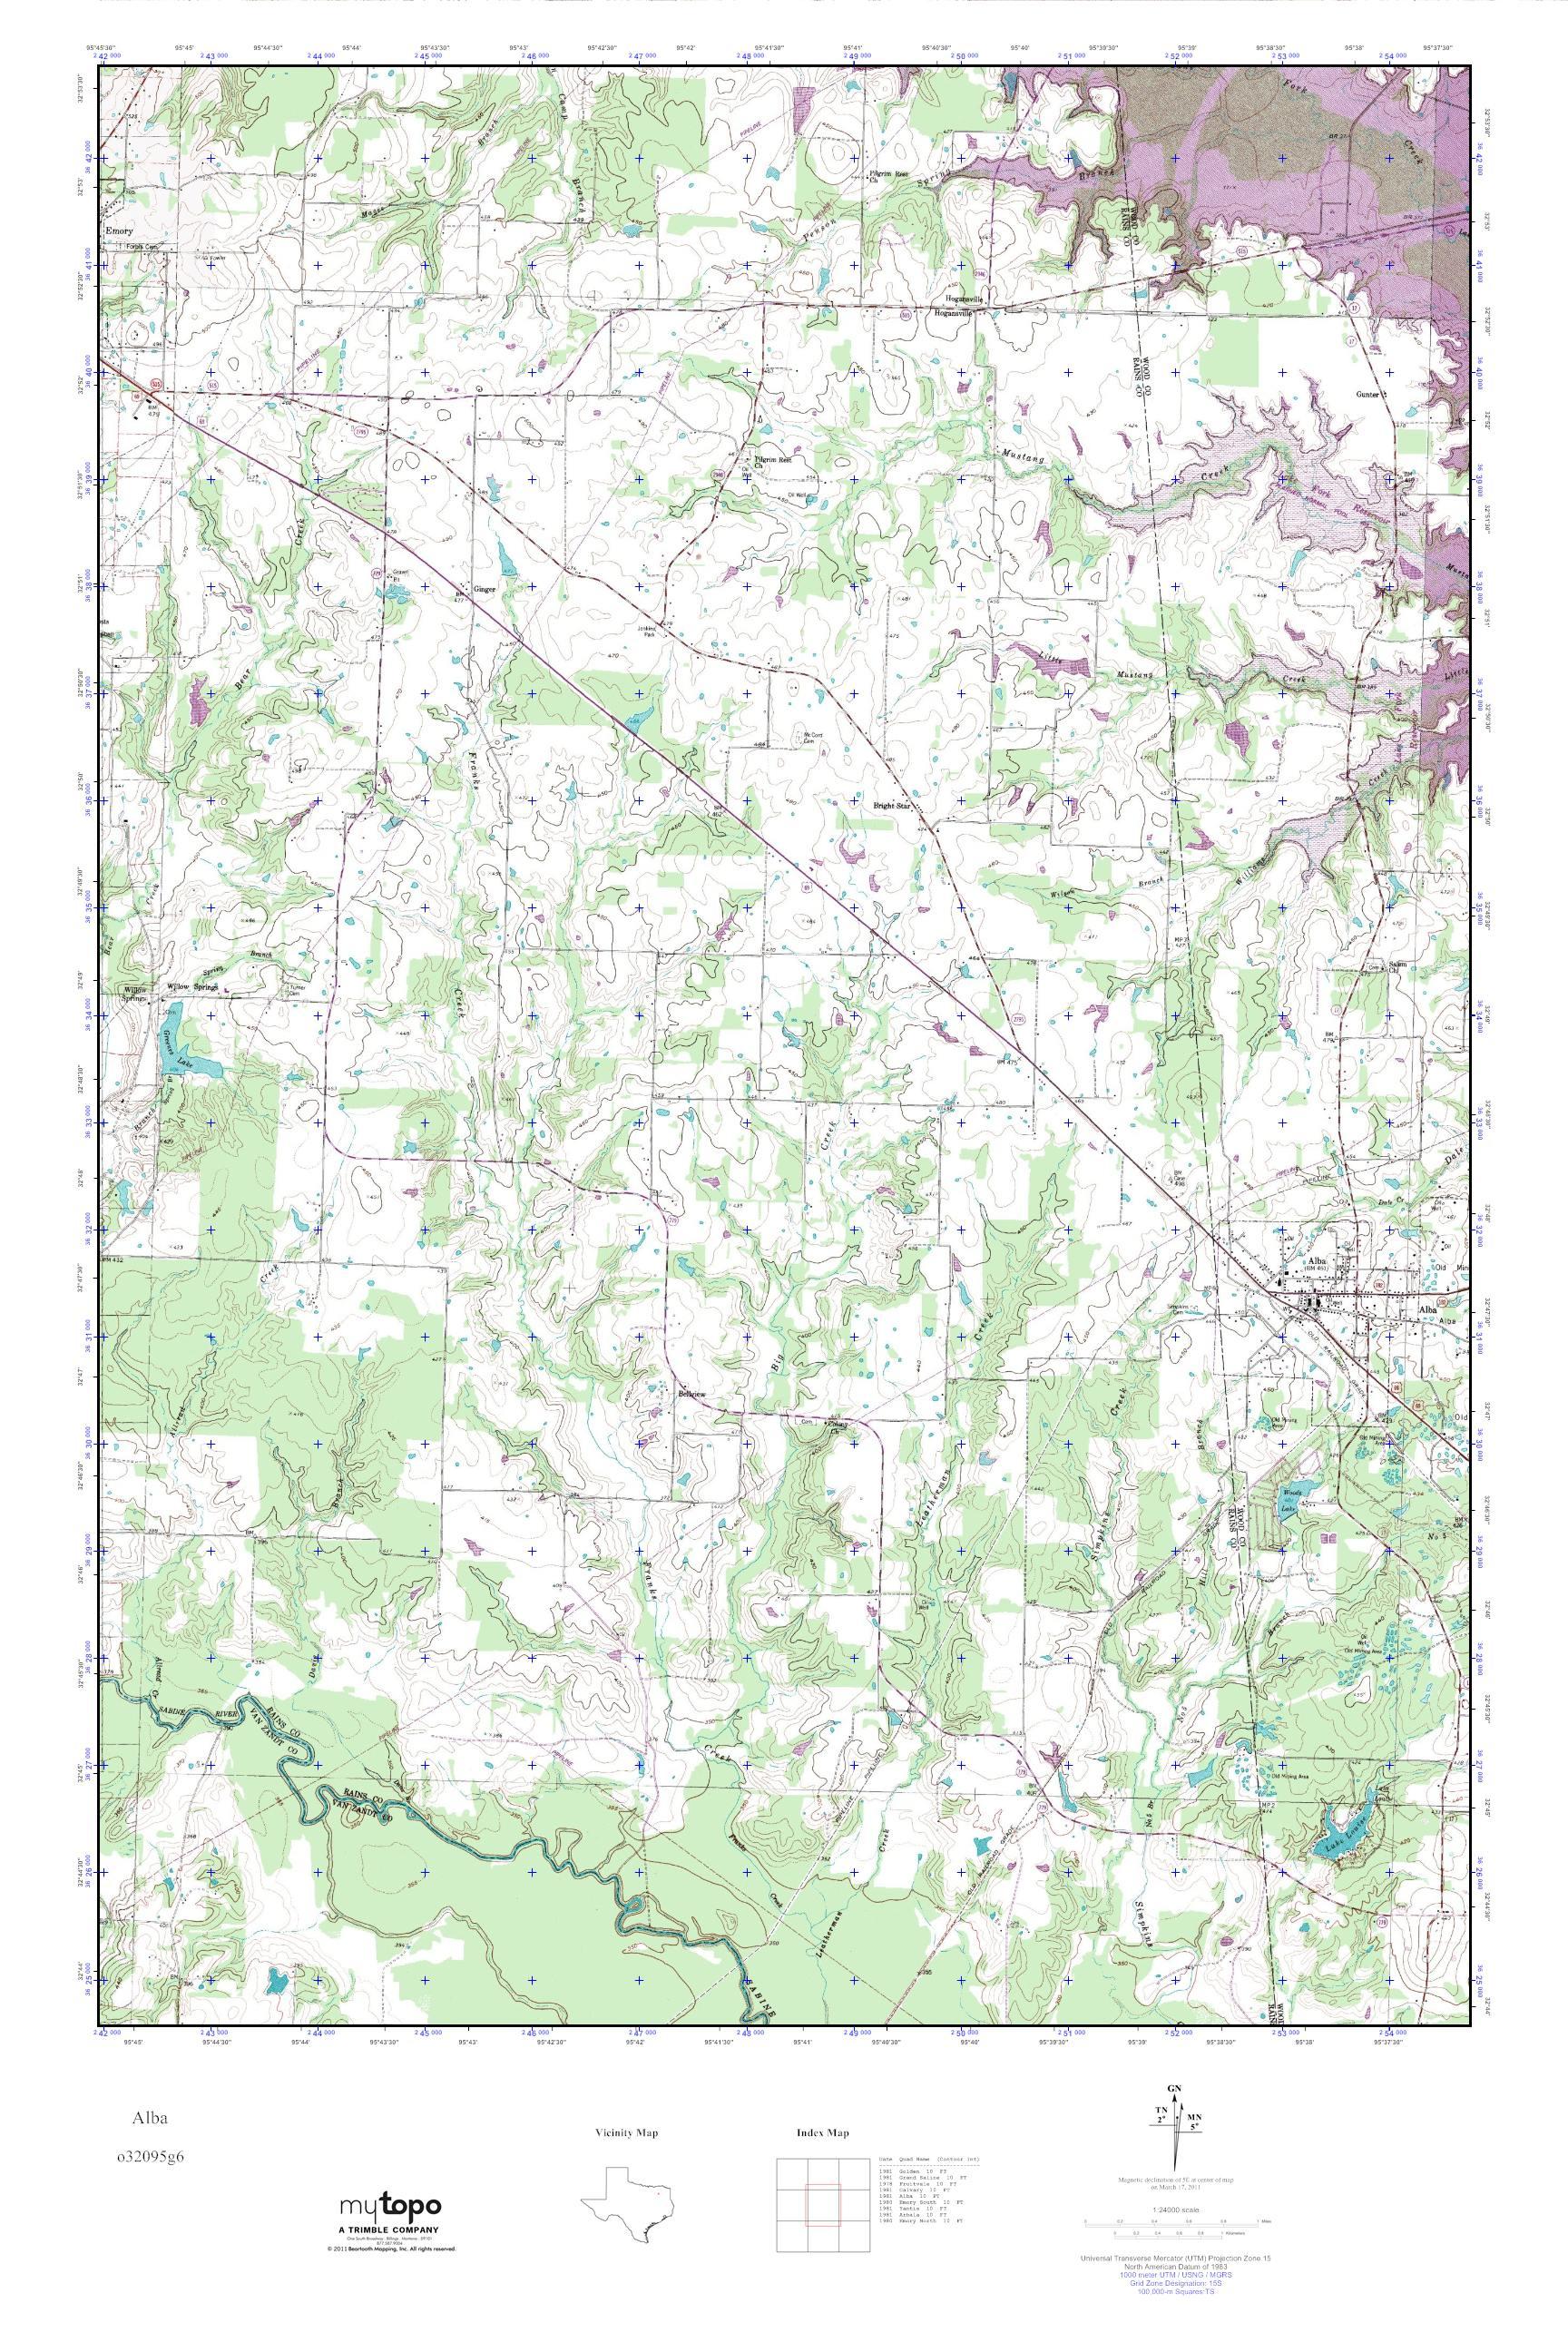 Mytopo Alba, Texas Usgs Quad Topo Map - Alba Texas Map